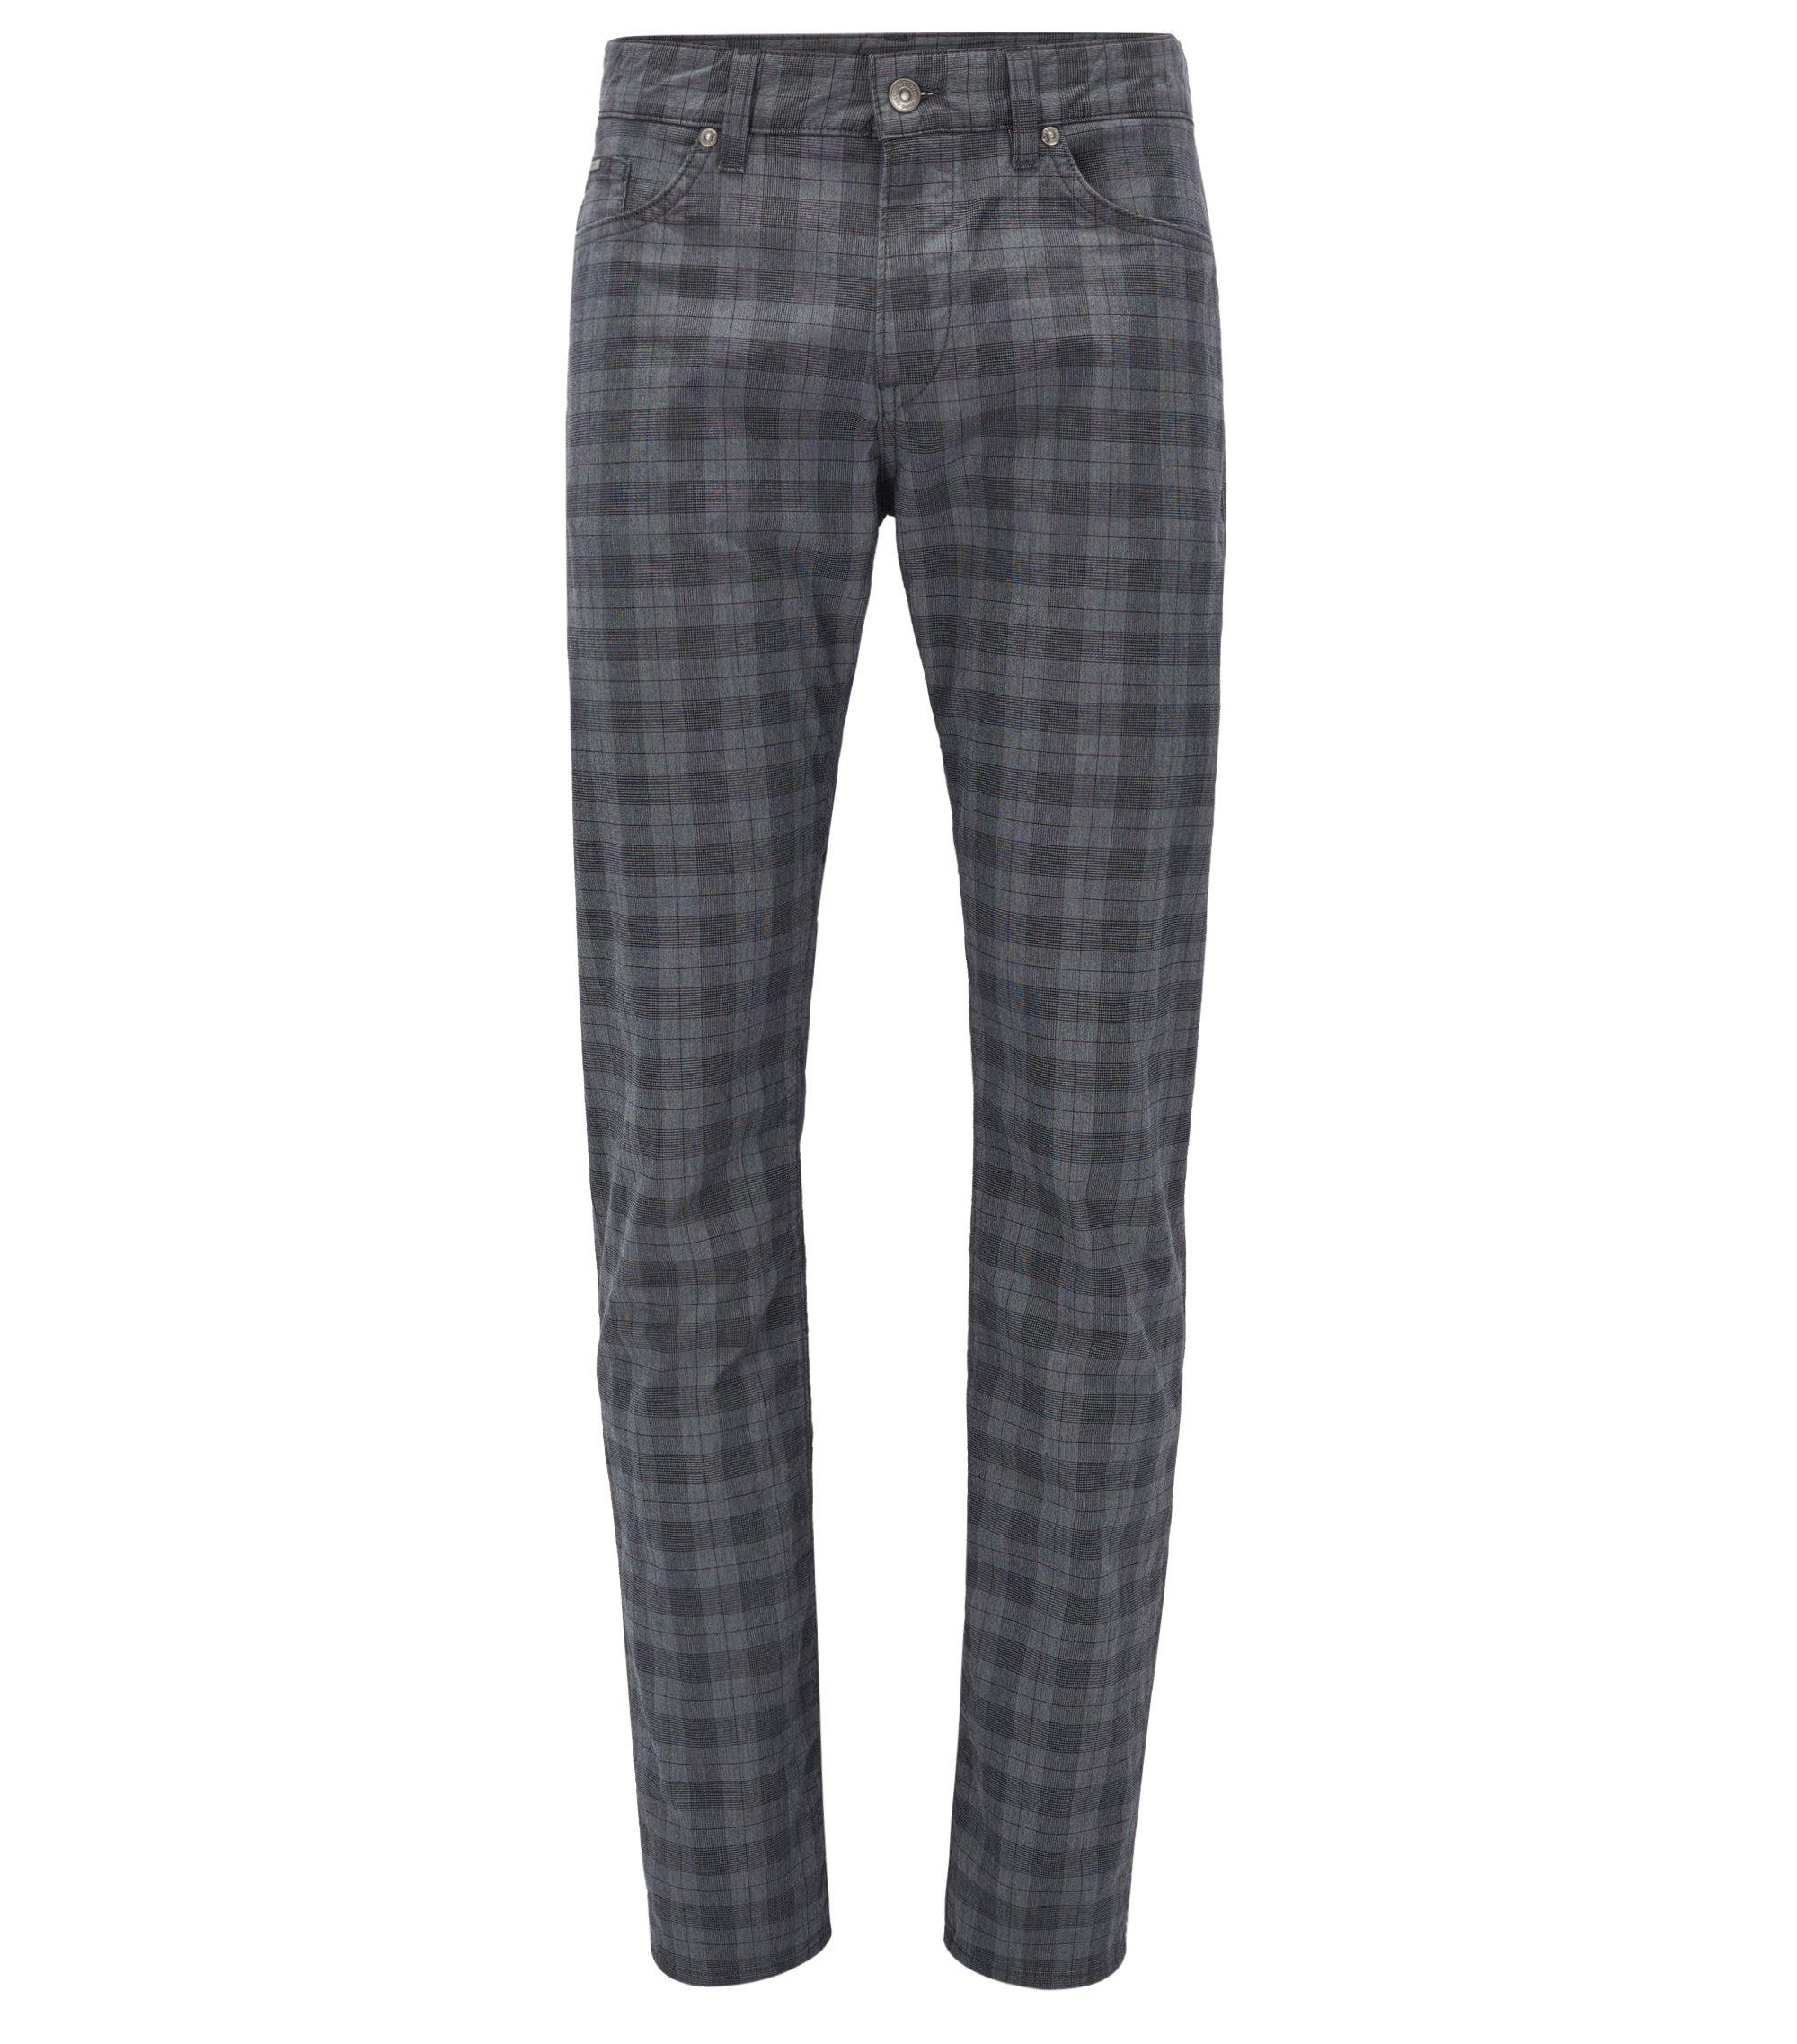 Plaid Stretch Cotton Pant, Slim Fit | Delaware, Open Grey